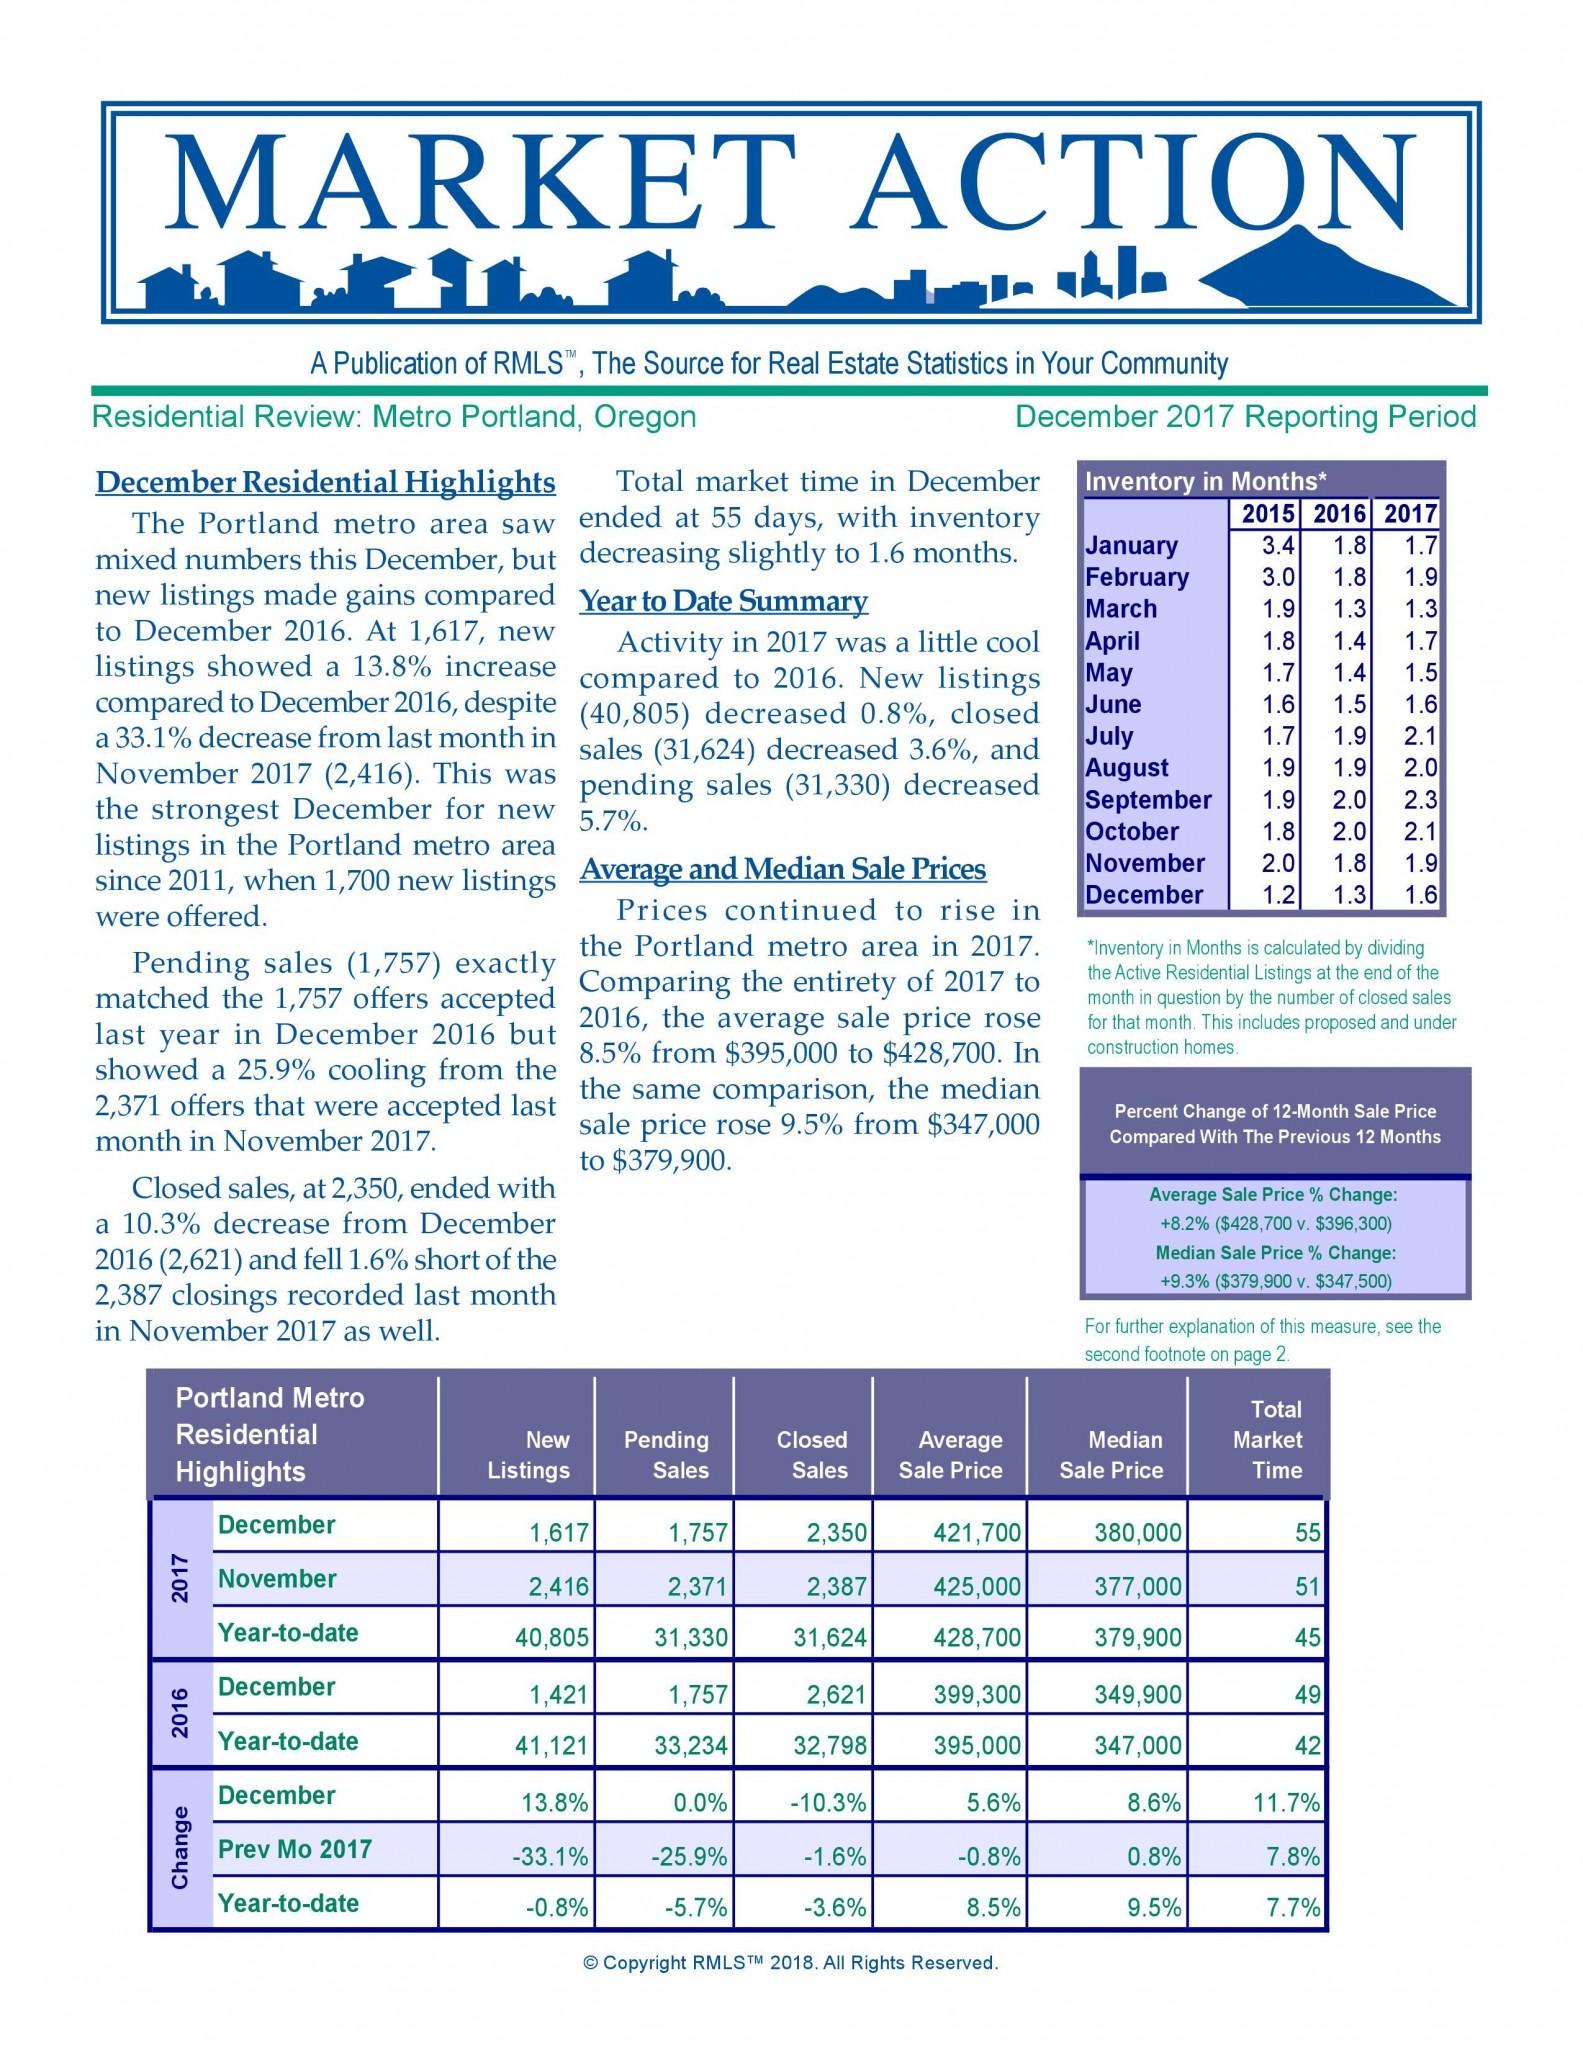 Portland Market Action Report December 2017